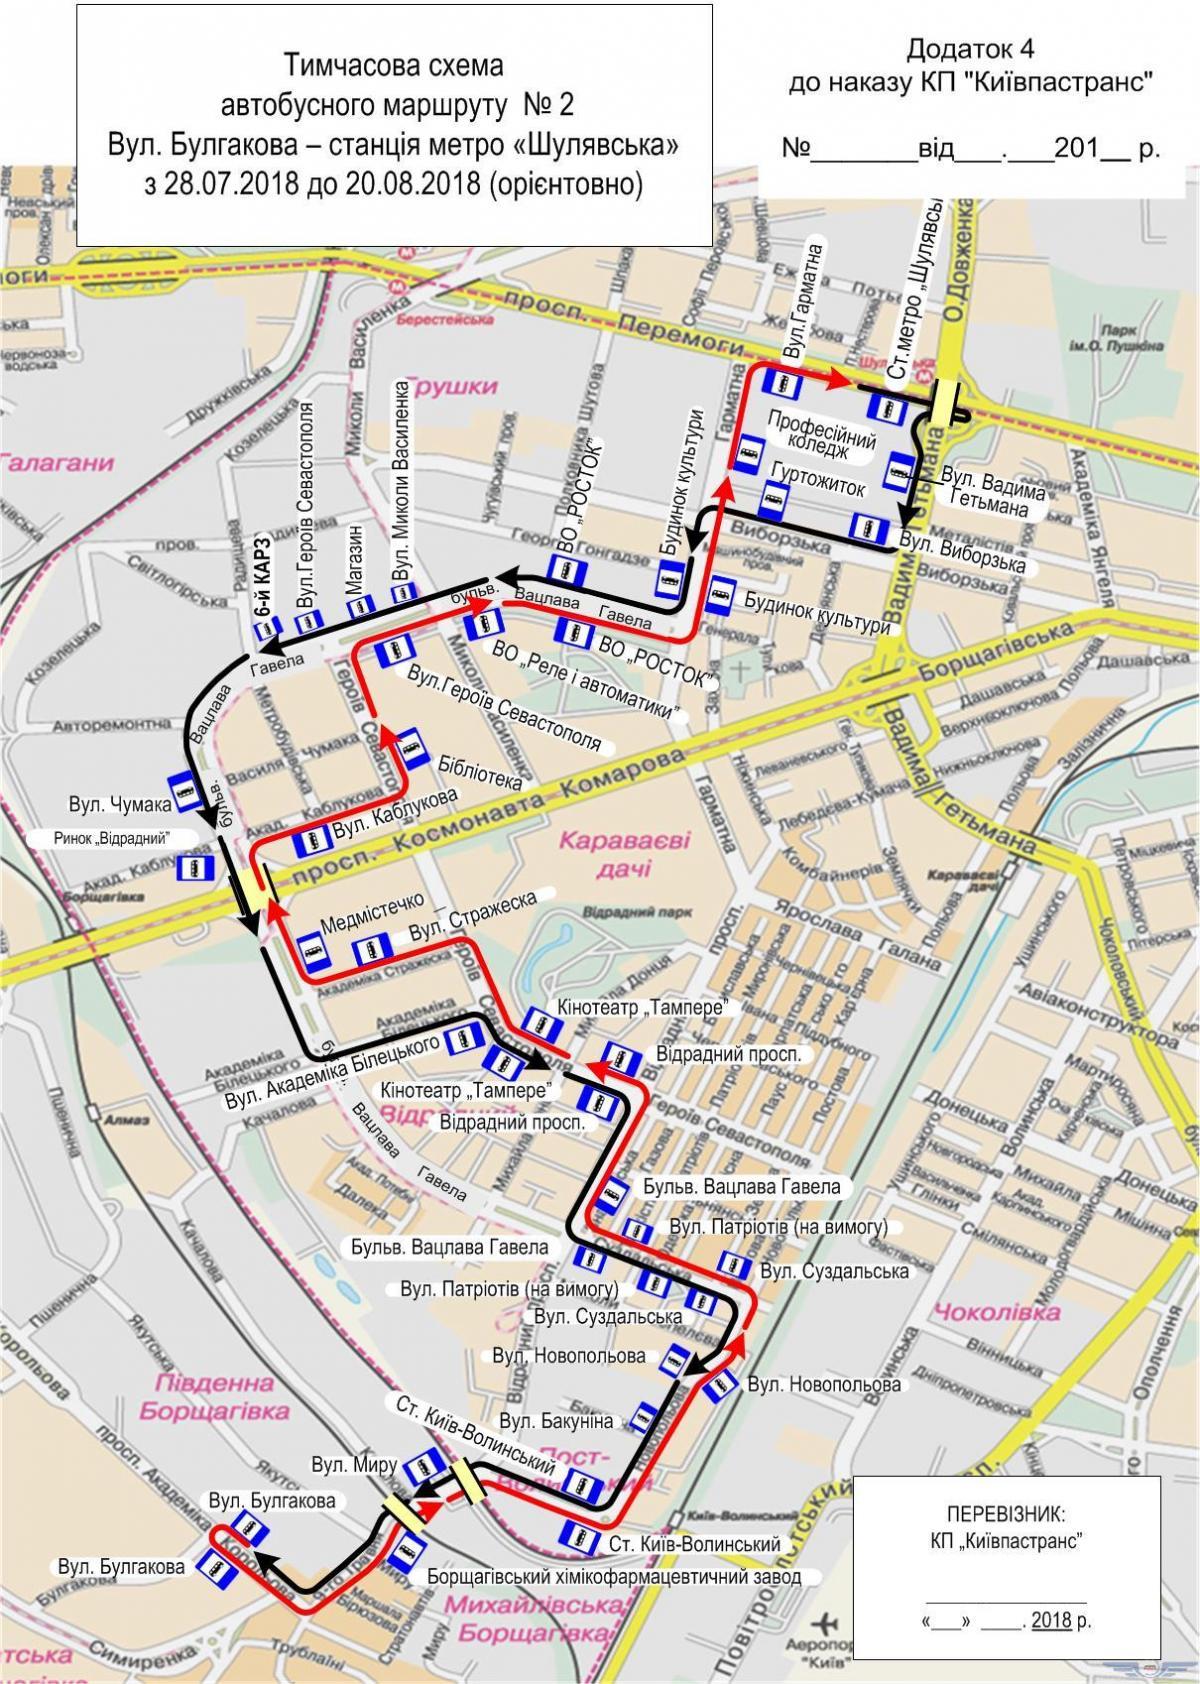 Трасса следования автобусного маршрута №2 / kpt.kiev.ua